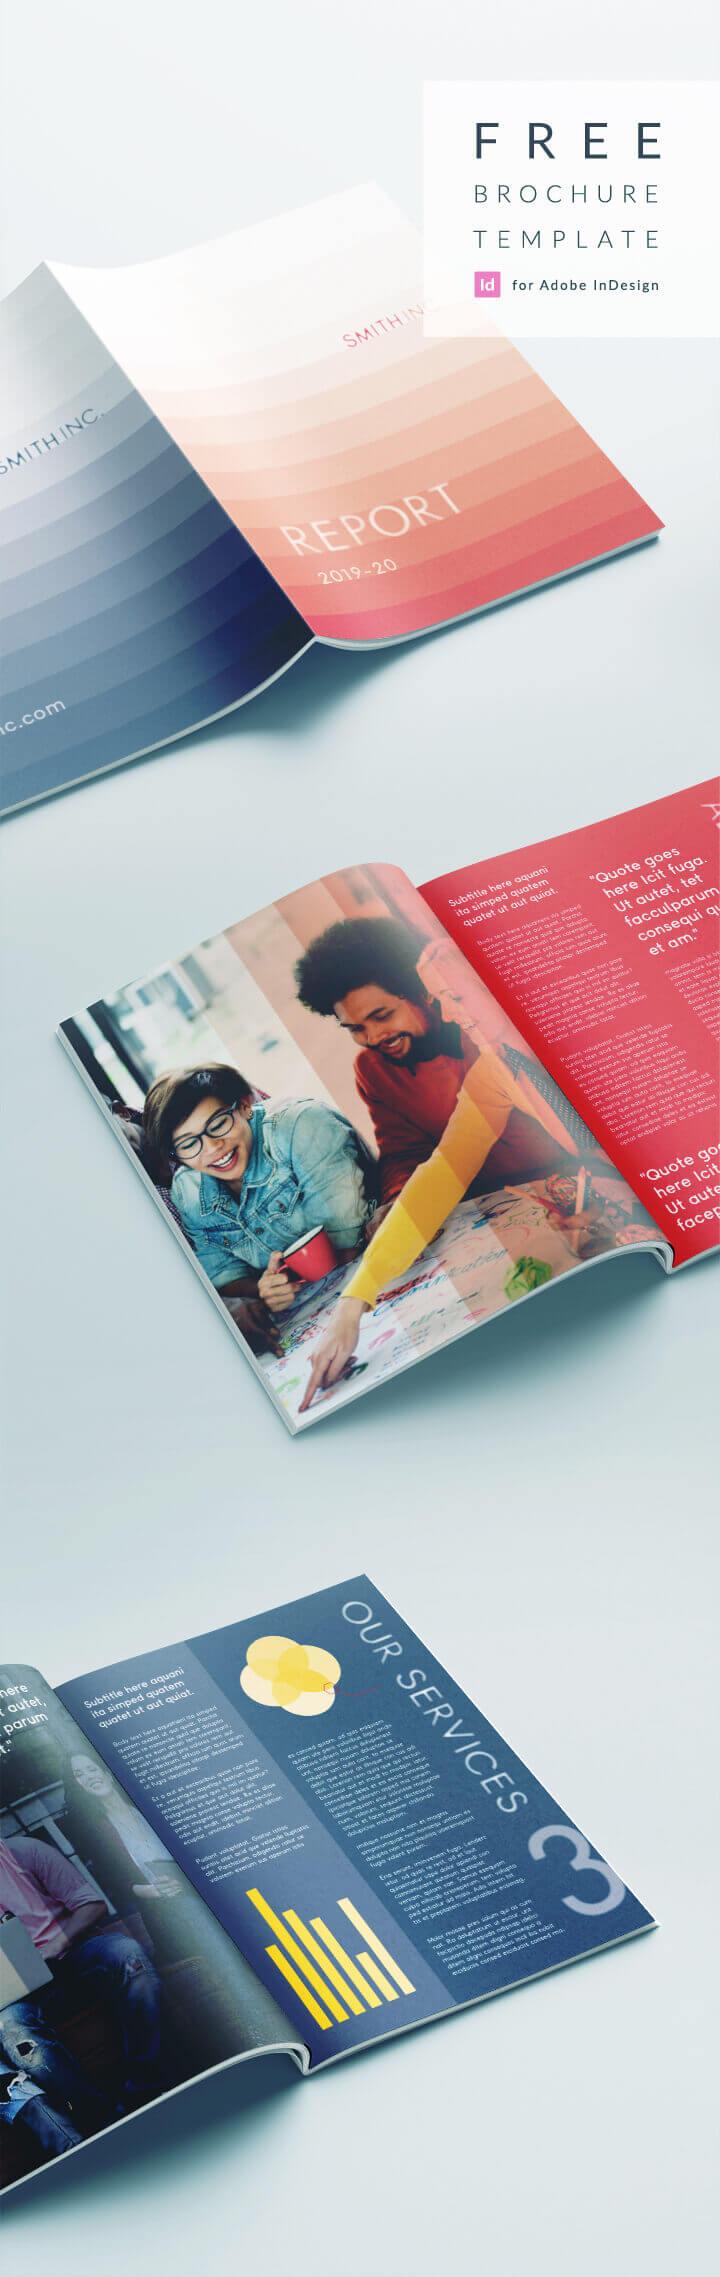 Elegant Corporate Brochure Or Report Indesign Template Throughout Free Indesign Report Templates